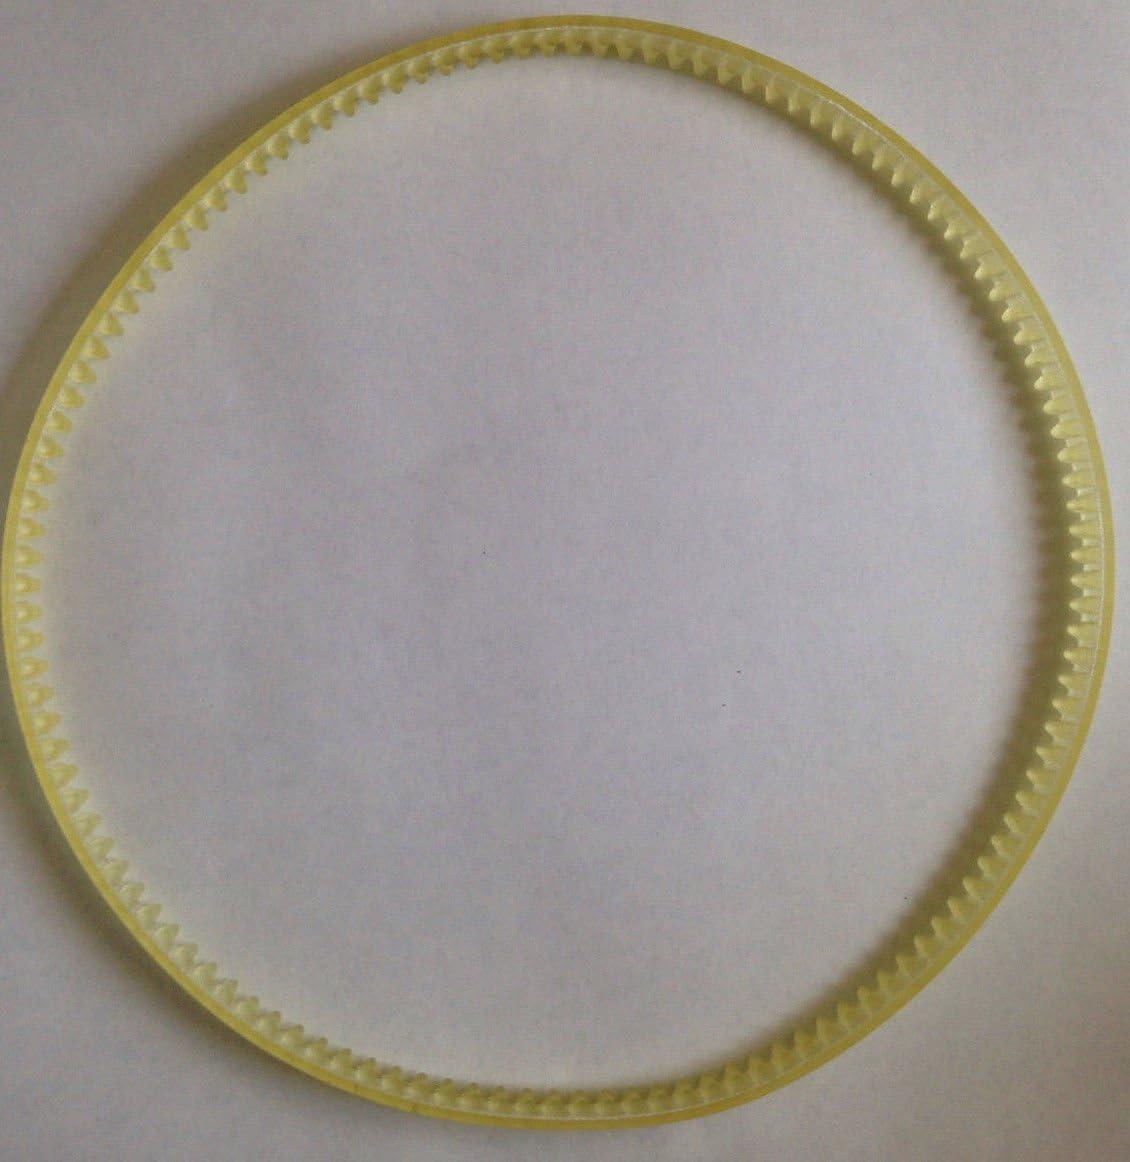 NEW After Market BELT Urethane Replacement V-BELT DRILL PRESS 13405007 K-509 DP120 Ryobi